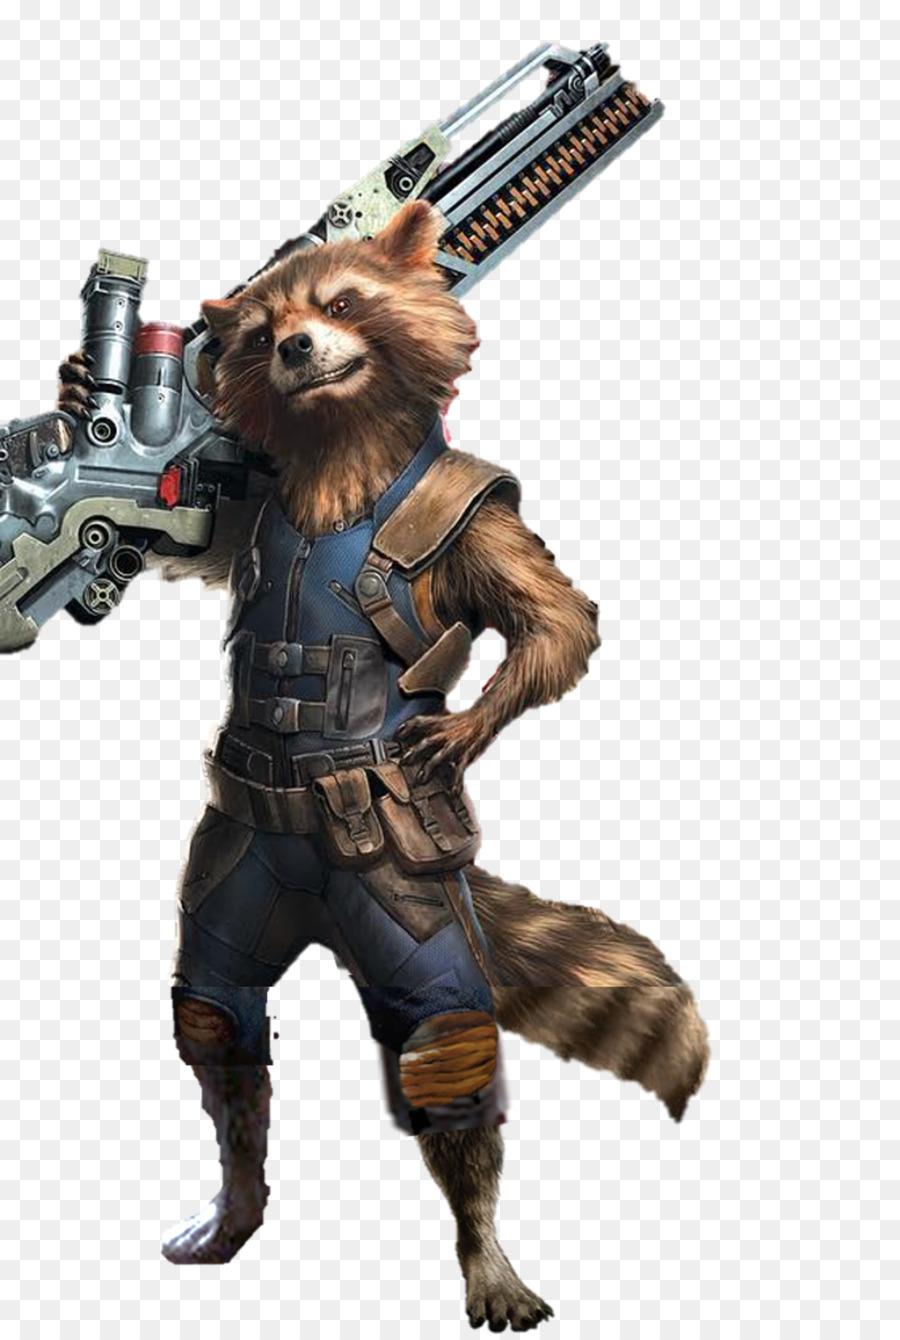 Star Lord And Rocket Raccoon By Timothygreenii On Deviantart: Rocket Raccoon Thor Groot Iron Man Hulk